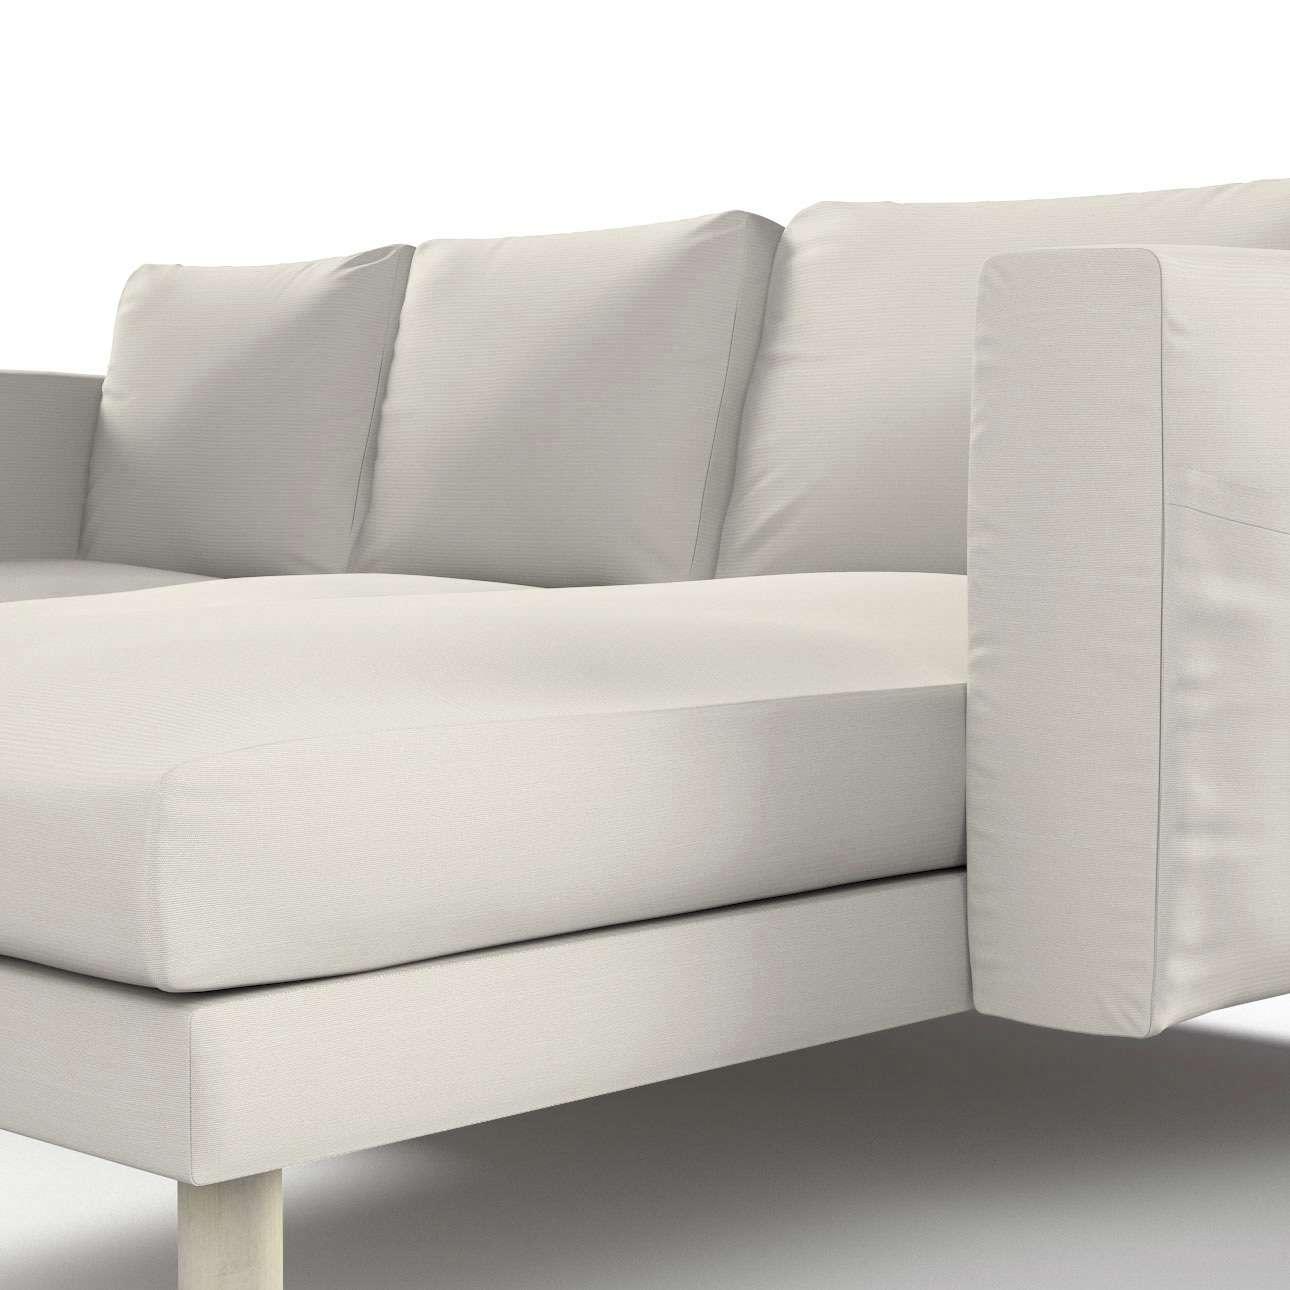 norsborg bezug f r 3 sitzer sofa mit recamiere hellgrau. Black Bedroom Furniture Sets. Home Design Ideas